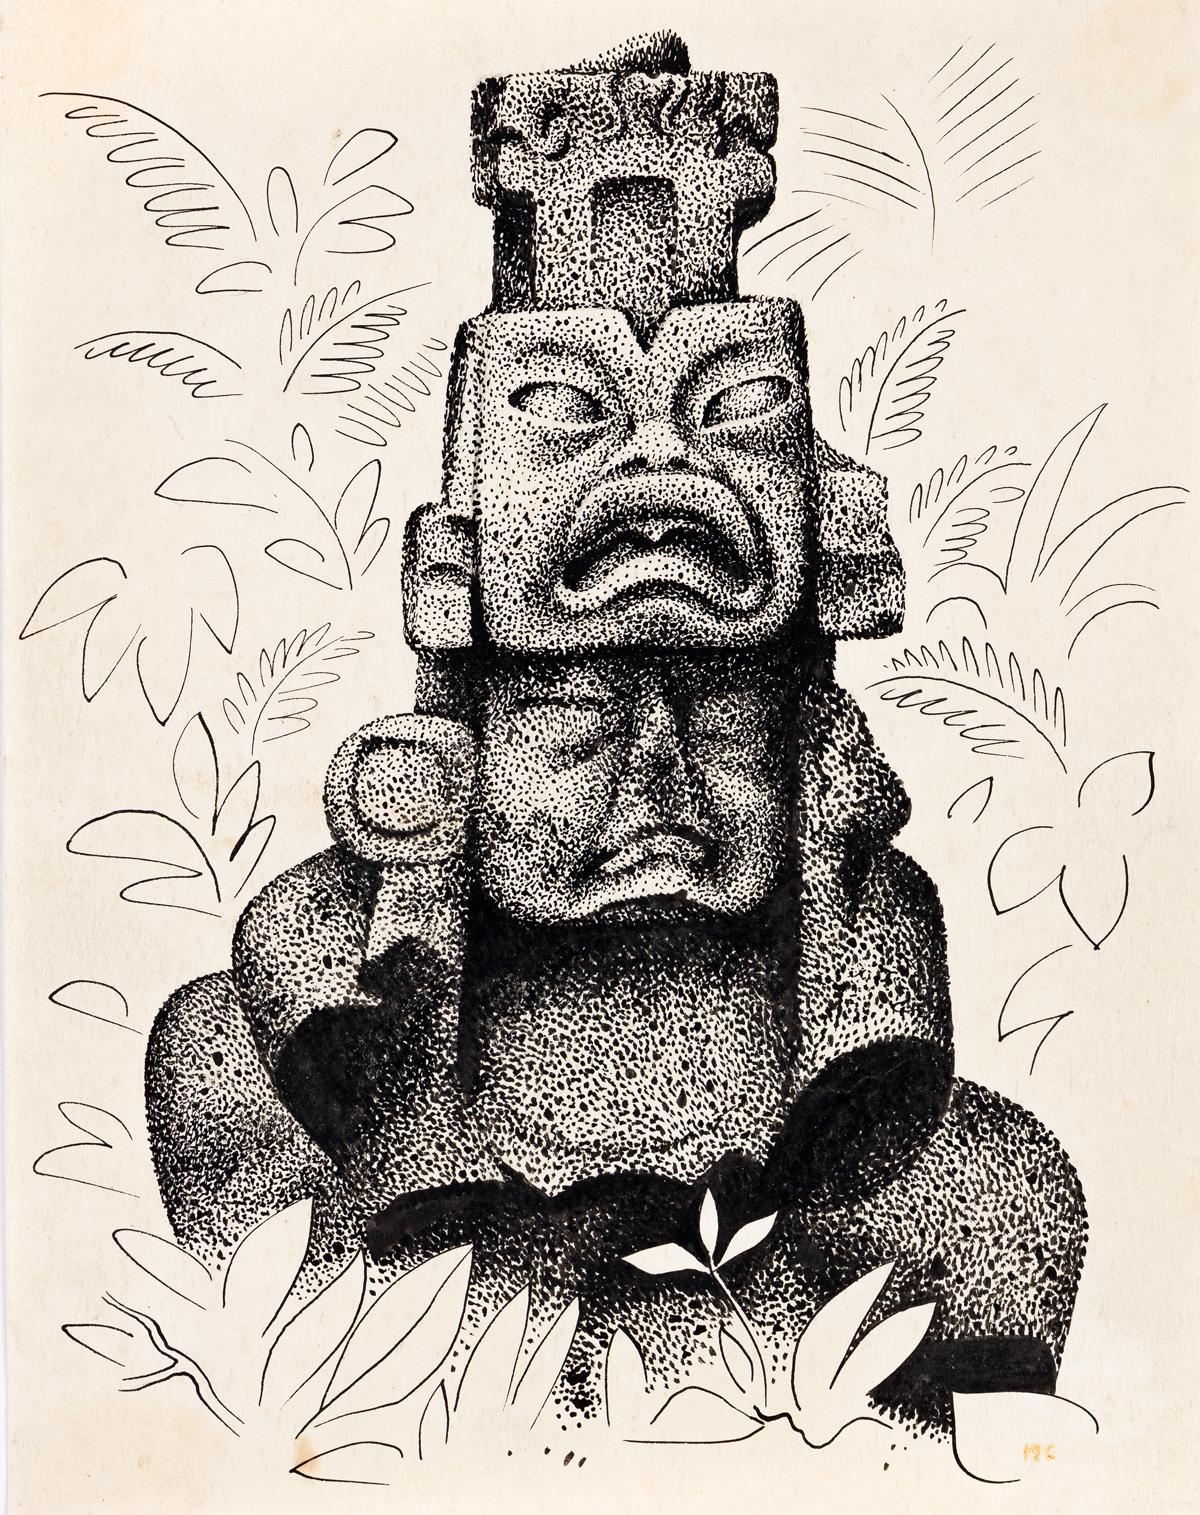 MIGUEL COVARRUBIAS (1904-1957) Idolo Maya.